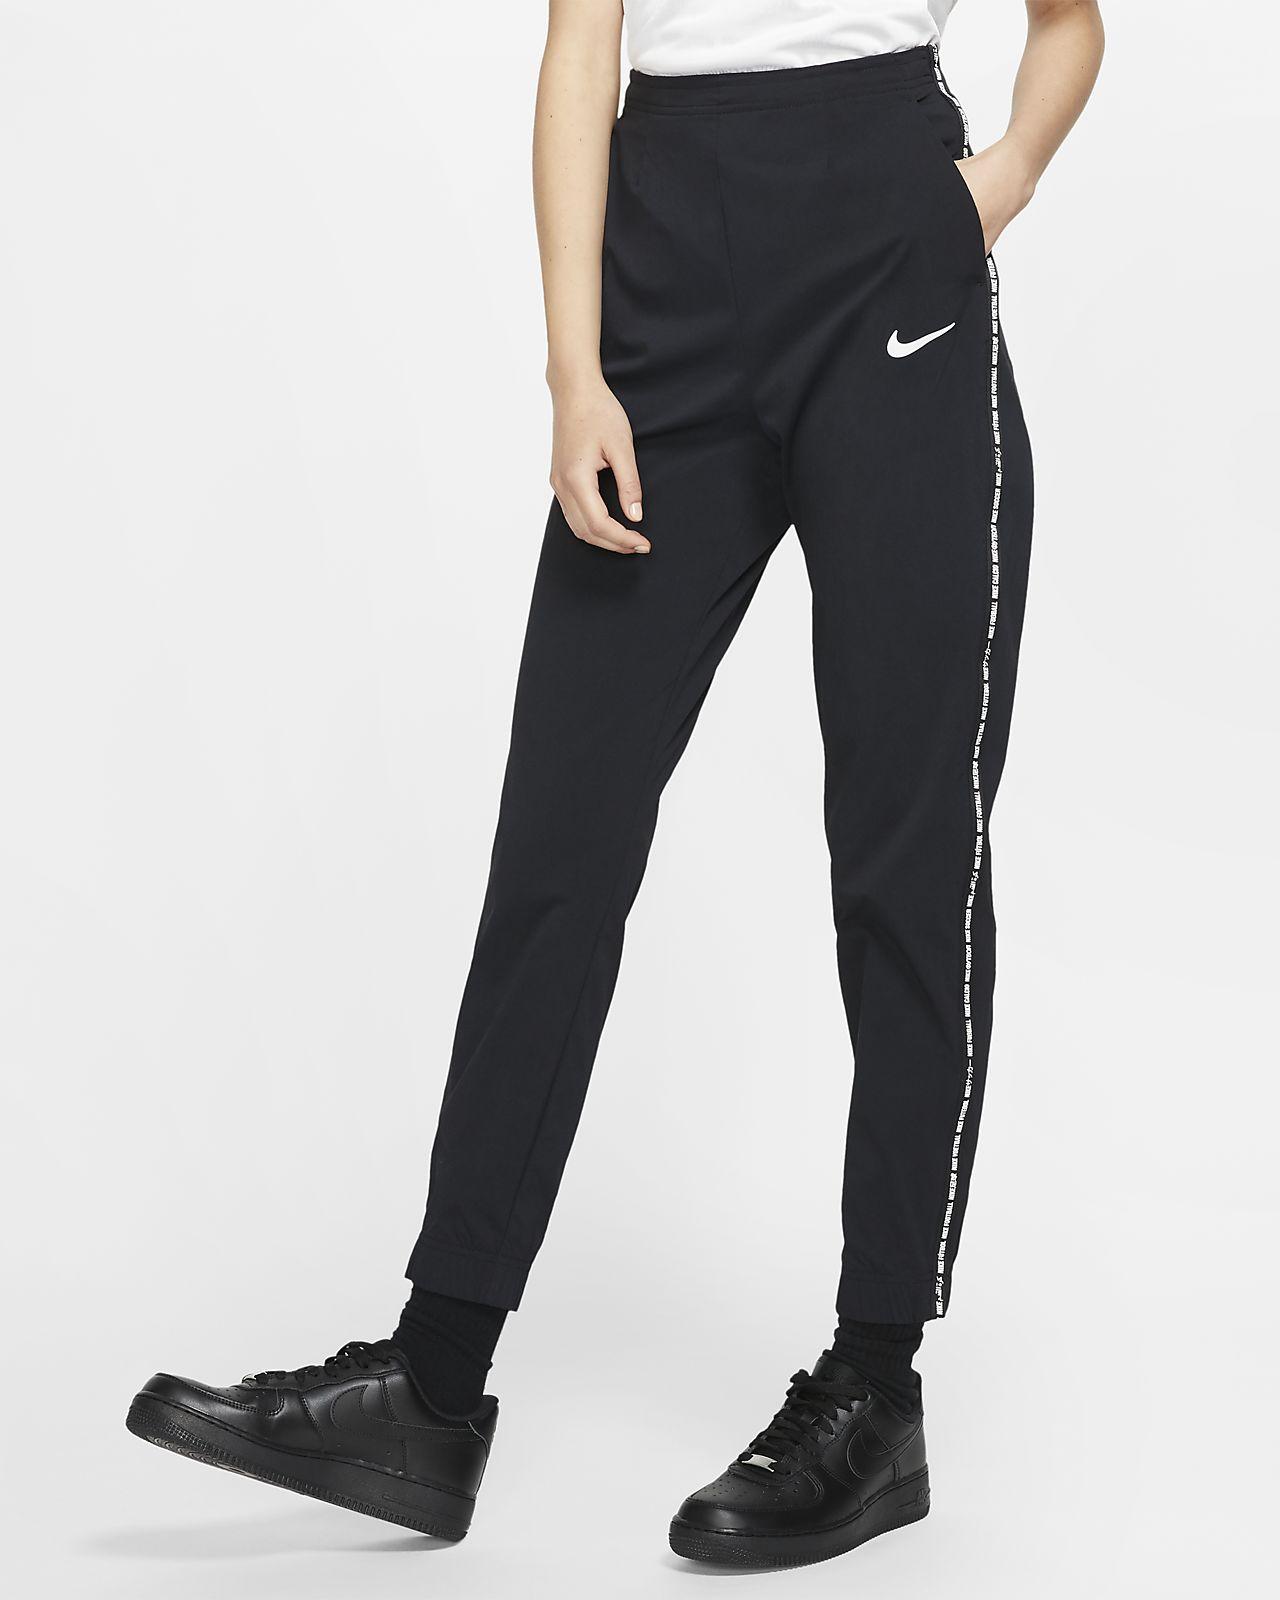 Nike F.C. Damen-Fußballhose